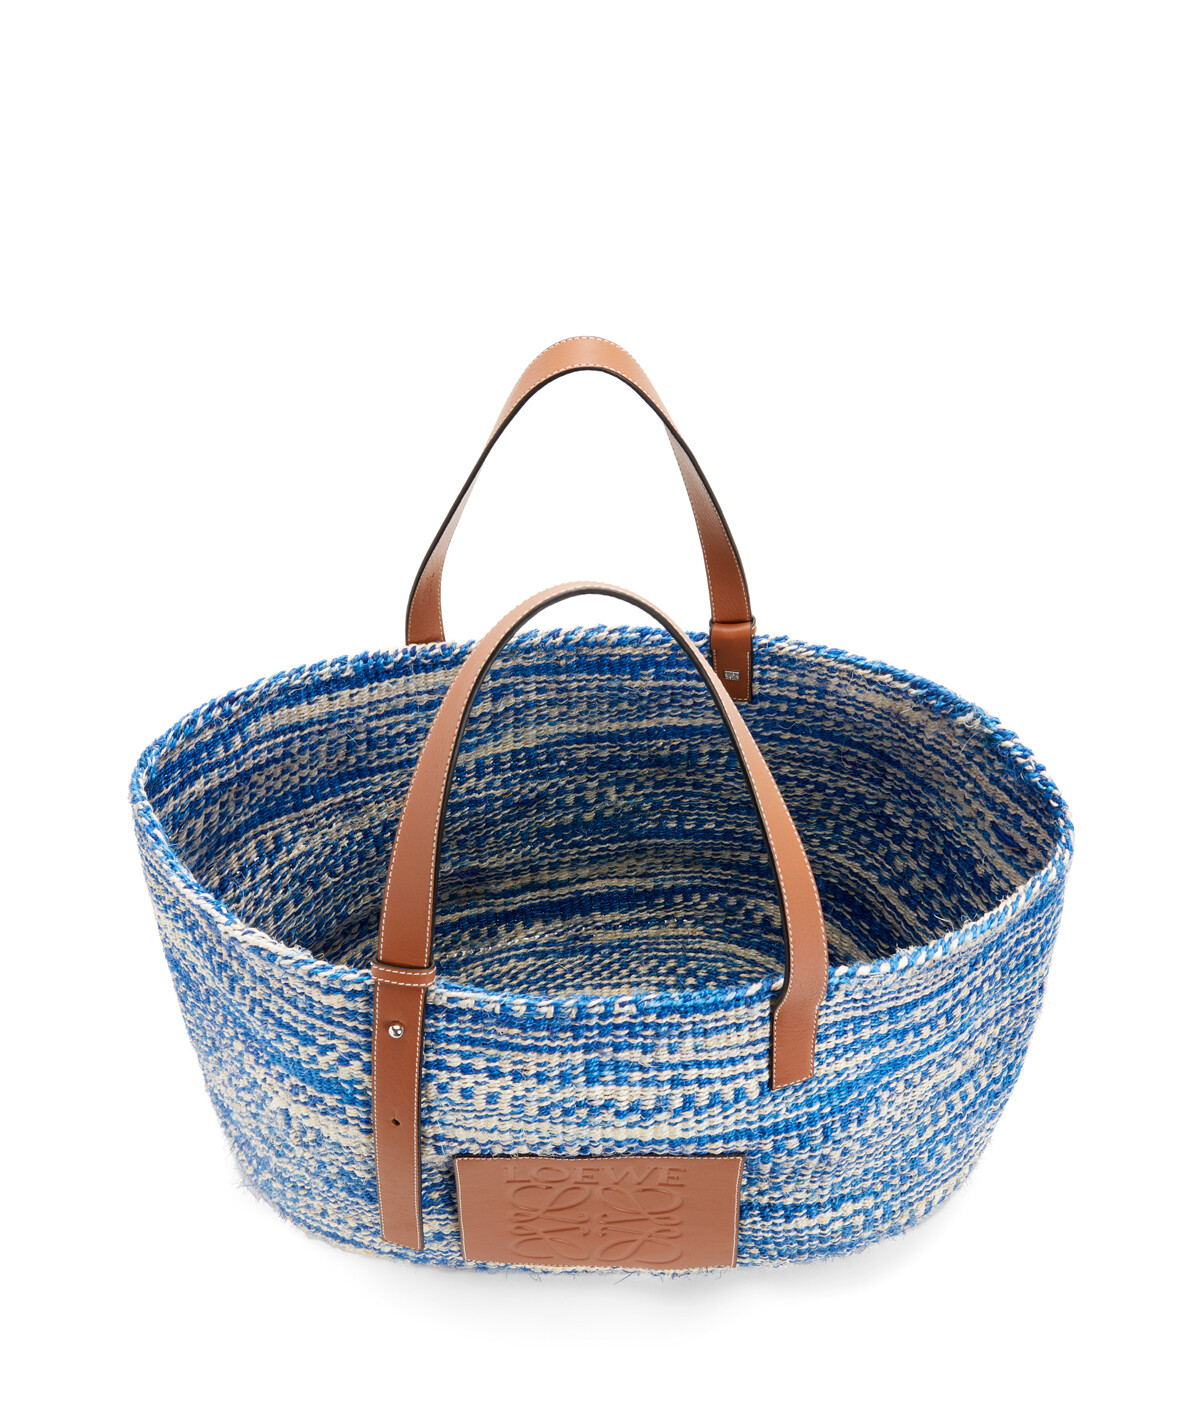 LOEWE Paula's Basket Large Bag Blue/Tan front